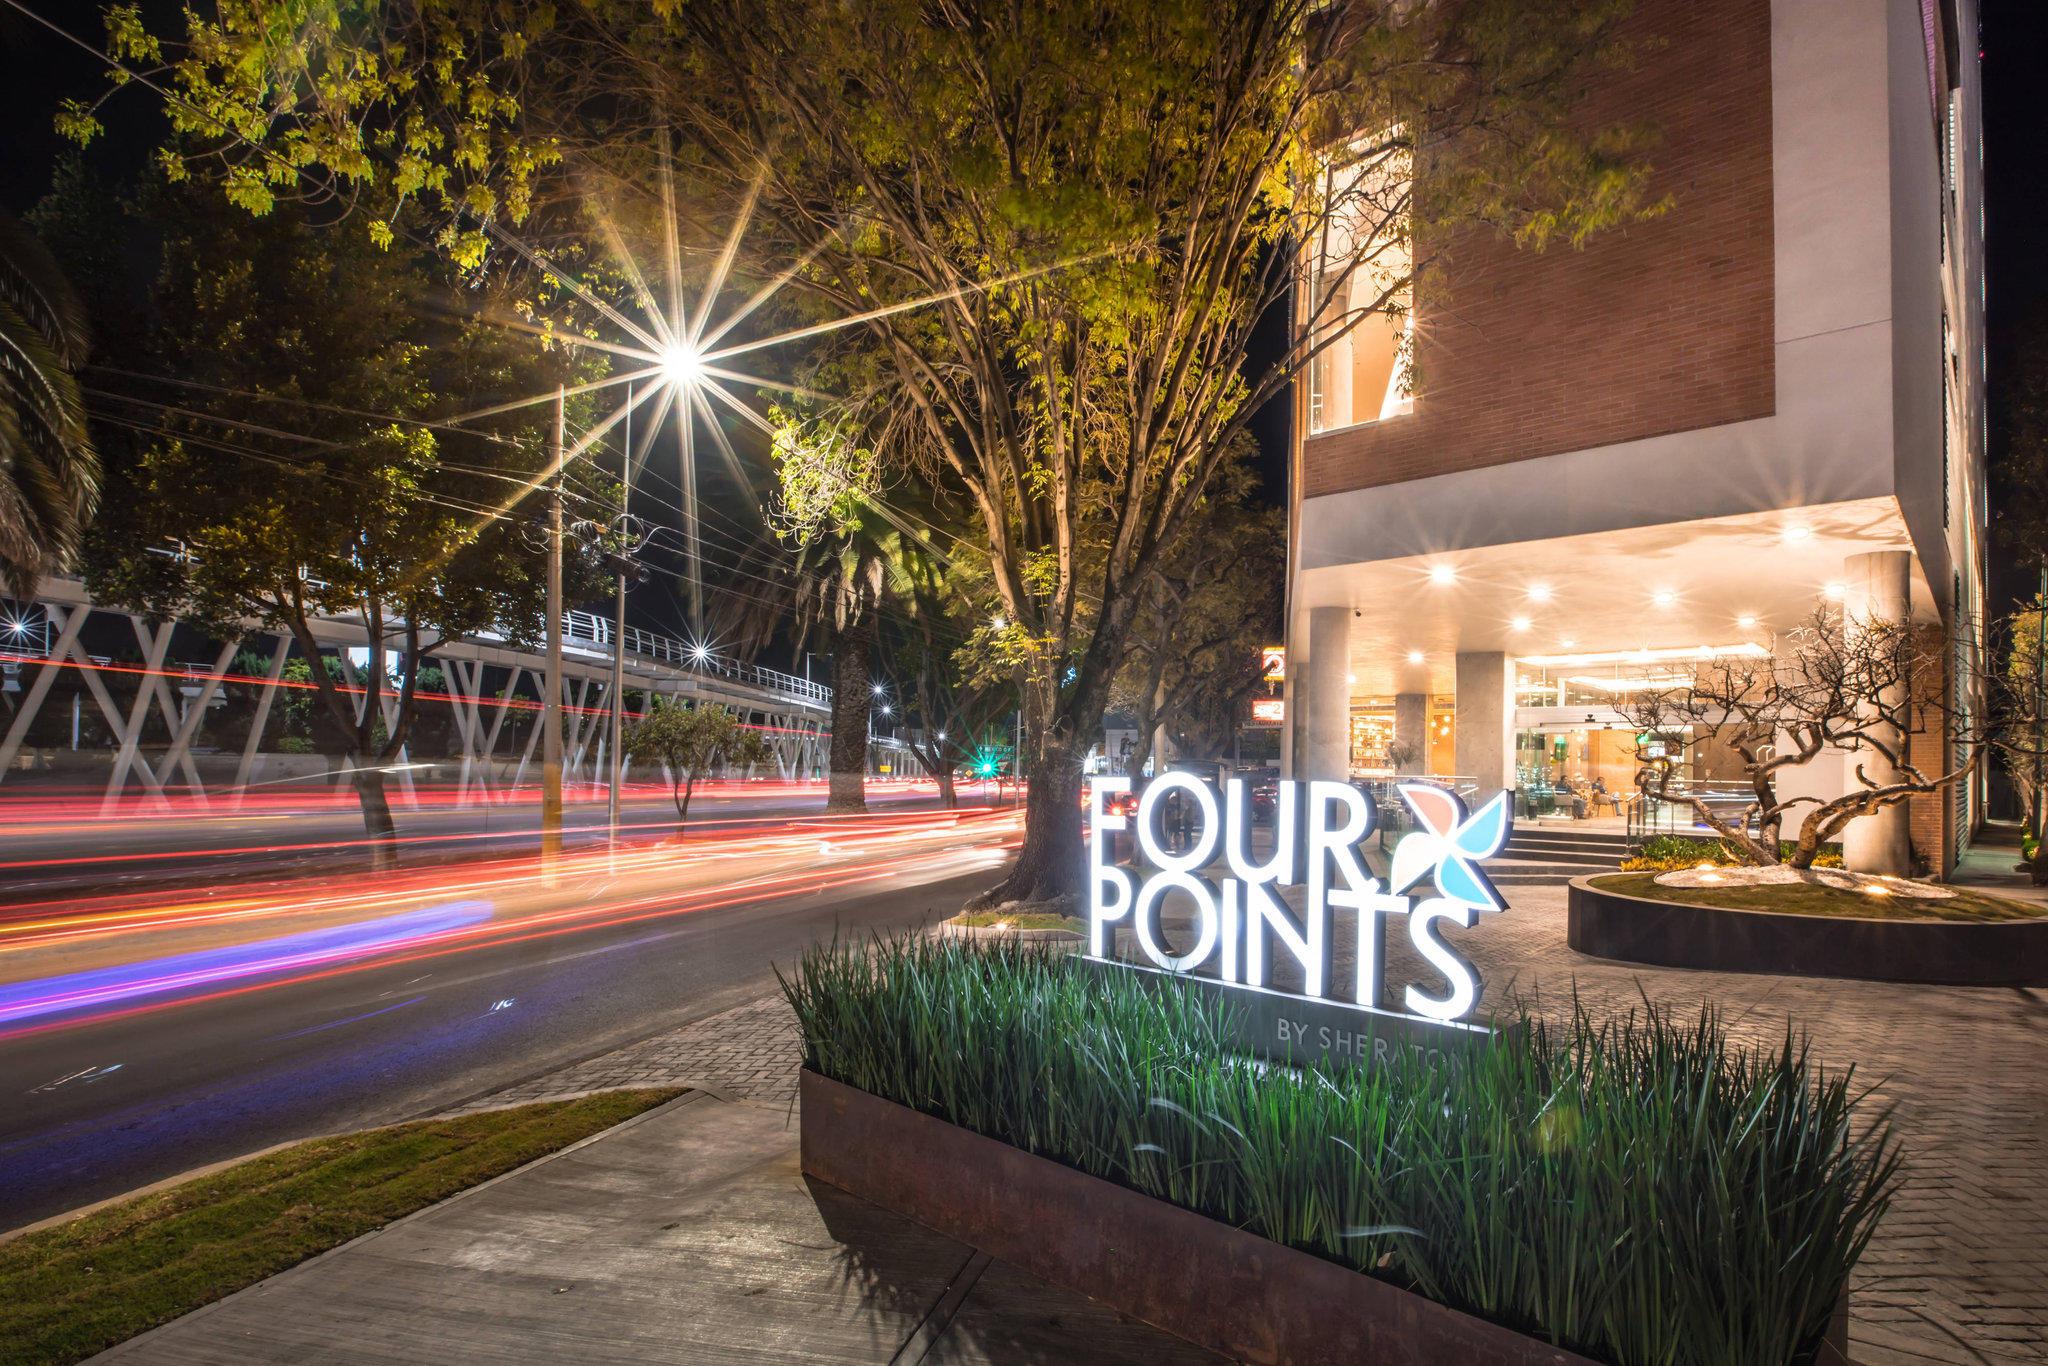 Four Points by Sheraton Puebla